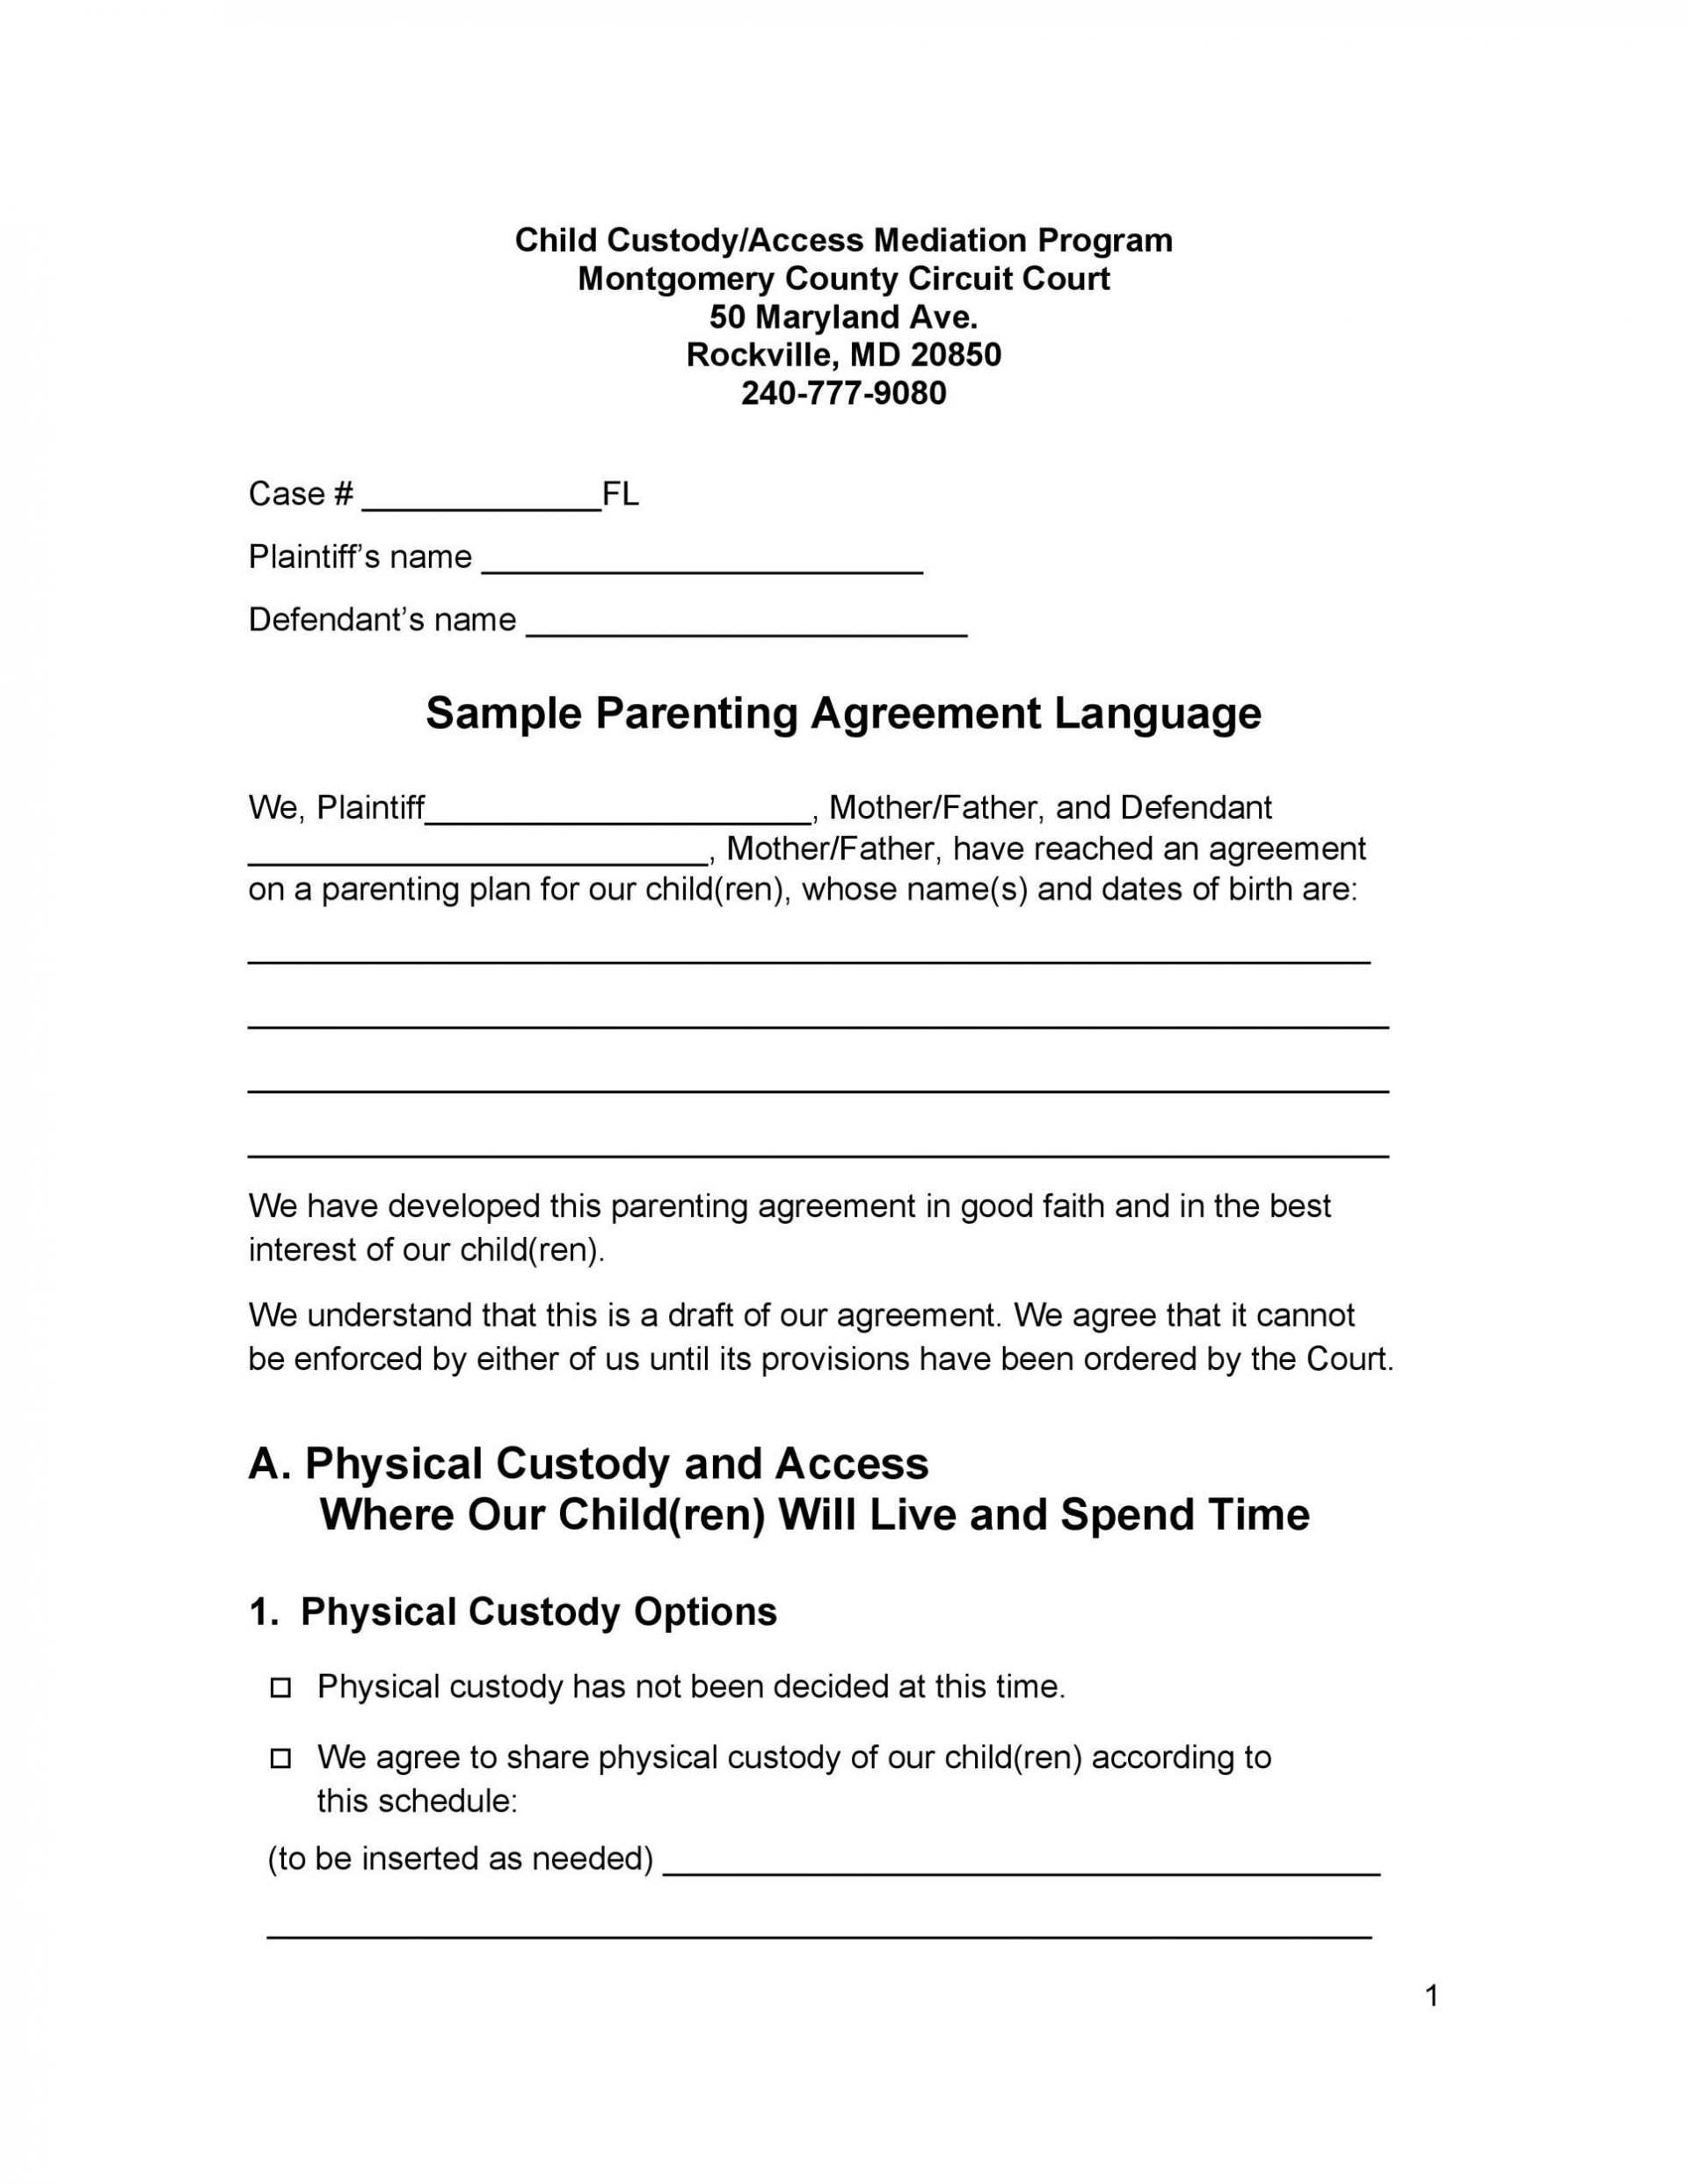 007 Top Child Custody Agreement Template High Definition  Texa Nj Uk1920